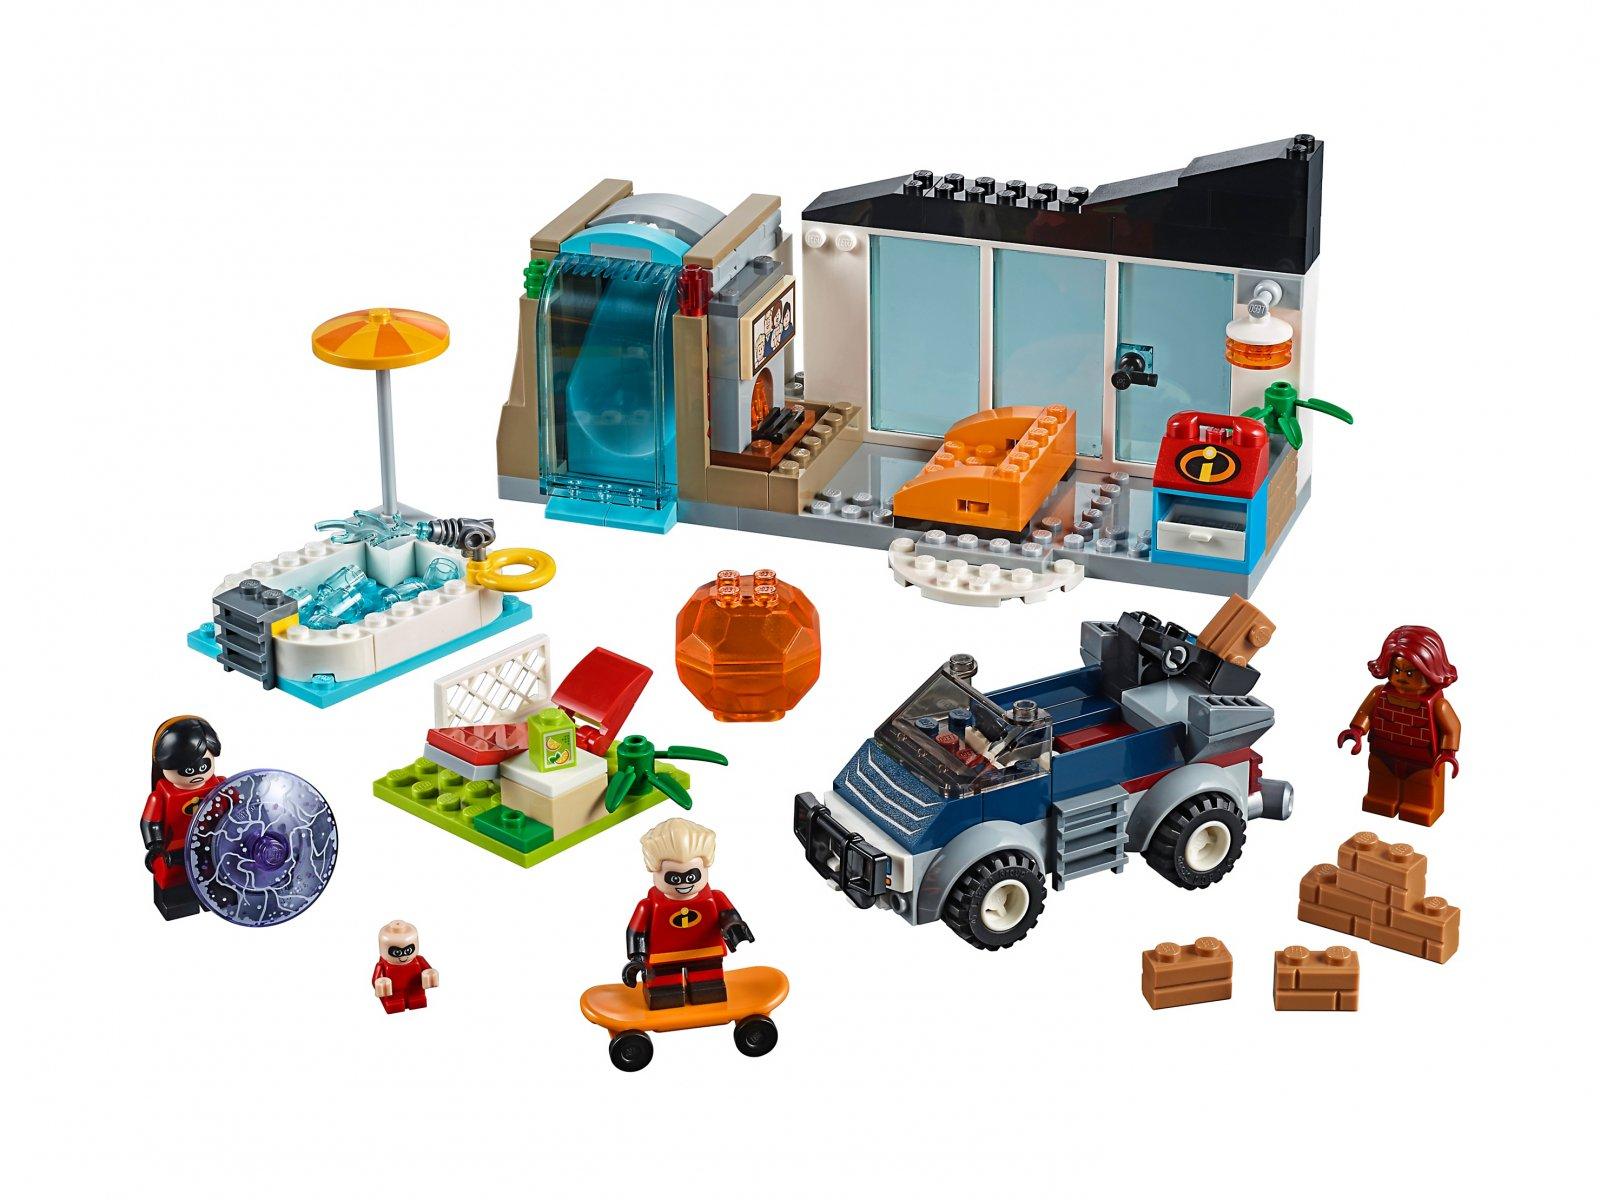 Lego Hero Factory Wielka Ucieczka Zagafricafr